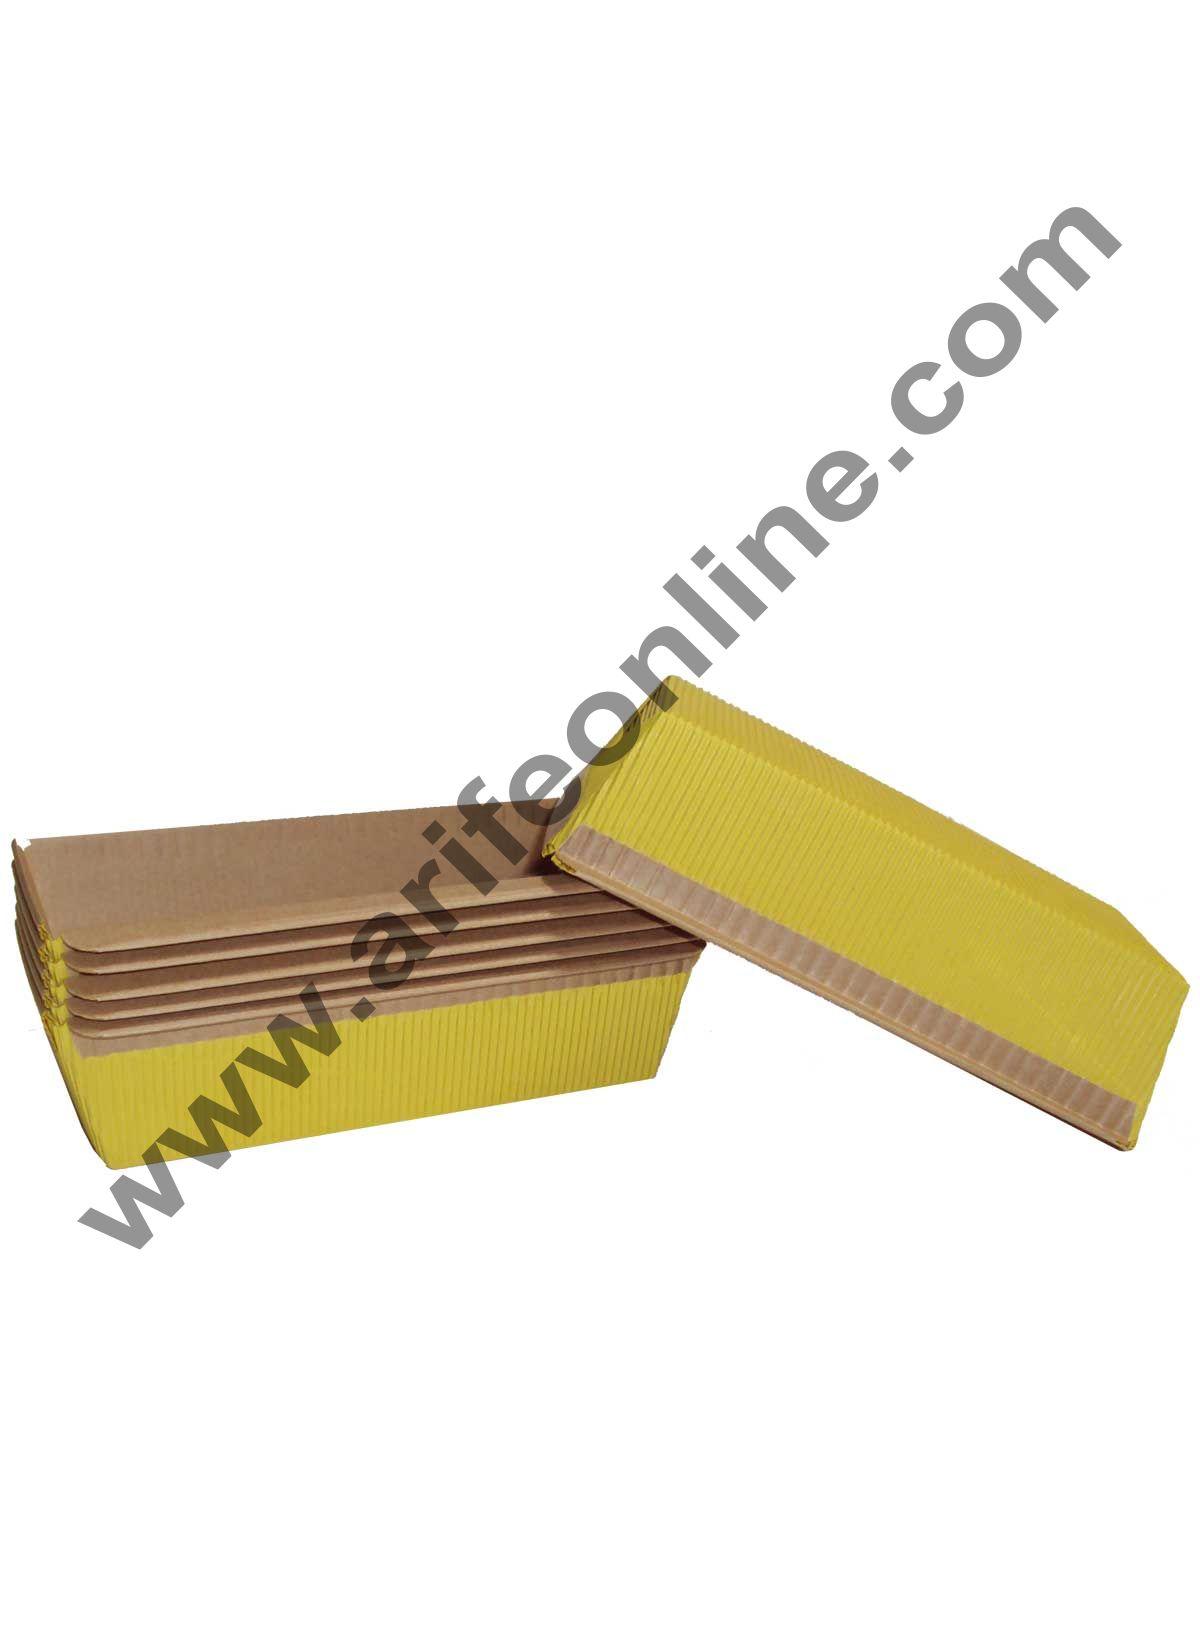 Novacart Bake & Serve Paper Baking Mould By Cake Decor - Plum Cake Mould Yellow 10 Pcs